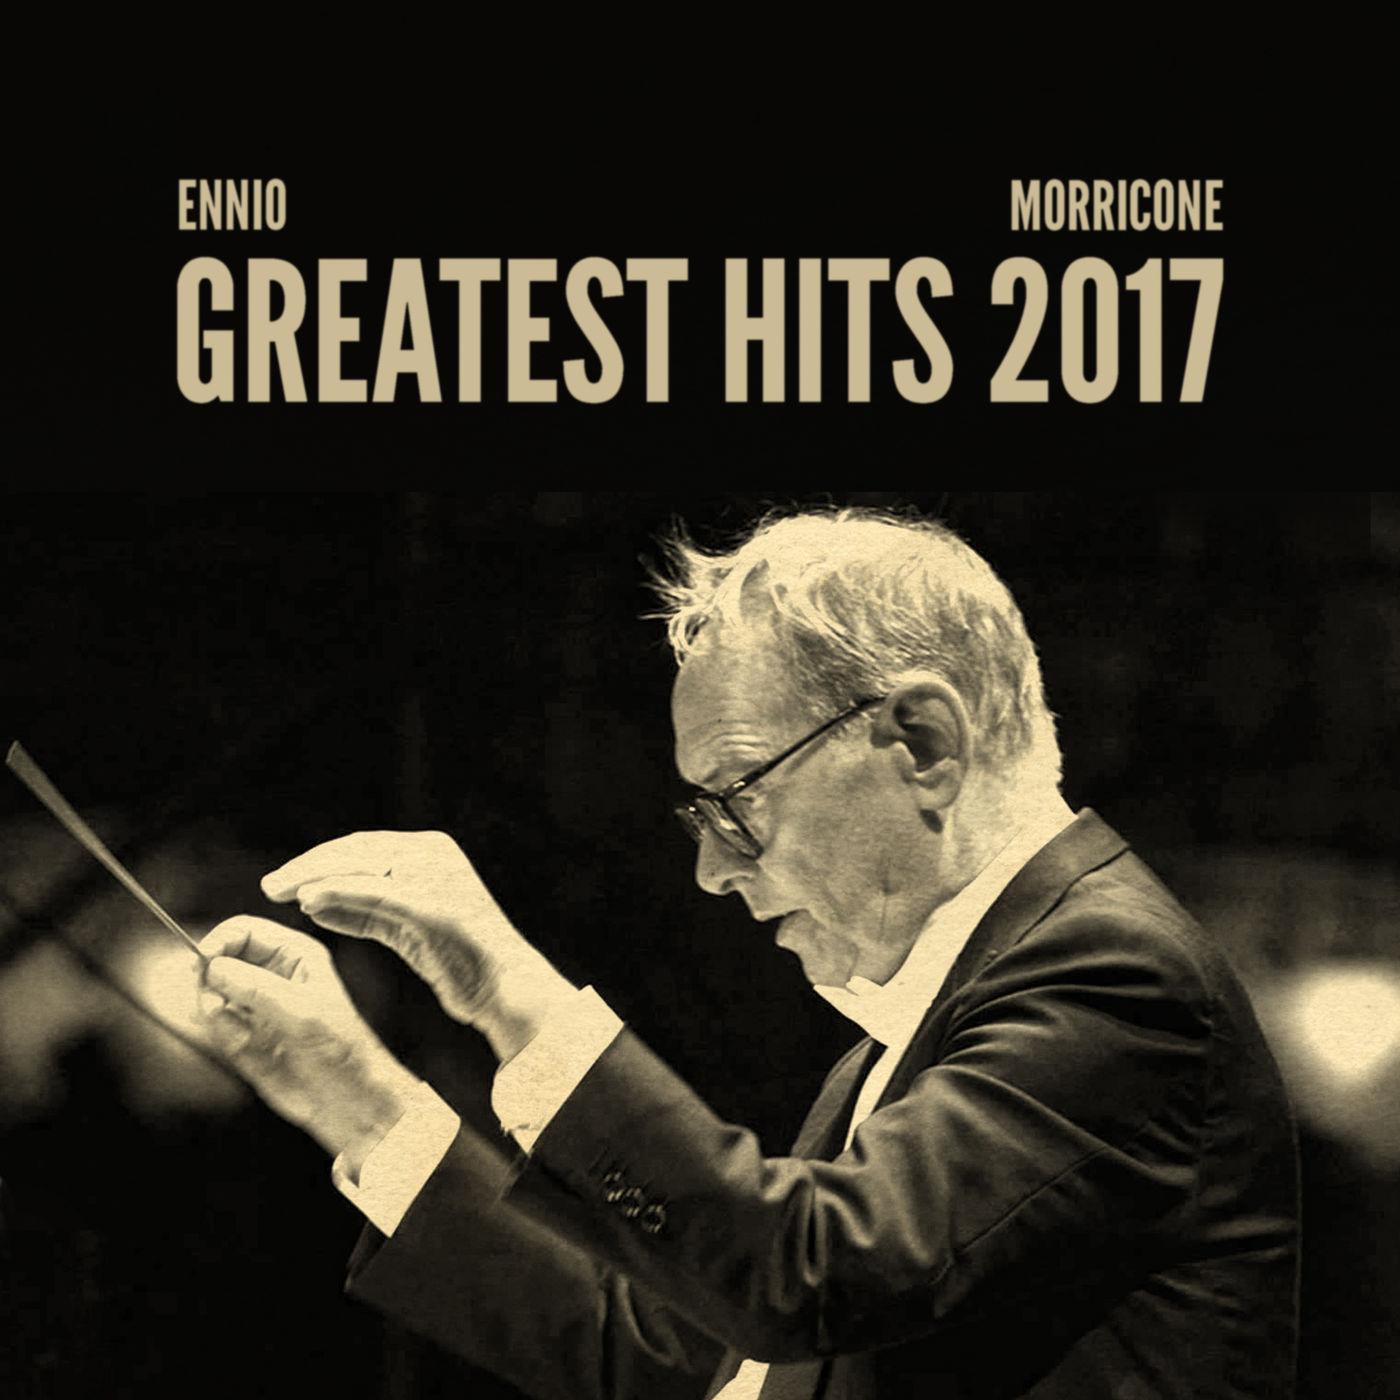 Ennio Morricone Greatest Hits 2017 (2017).mp3 - 320 Kbps